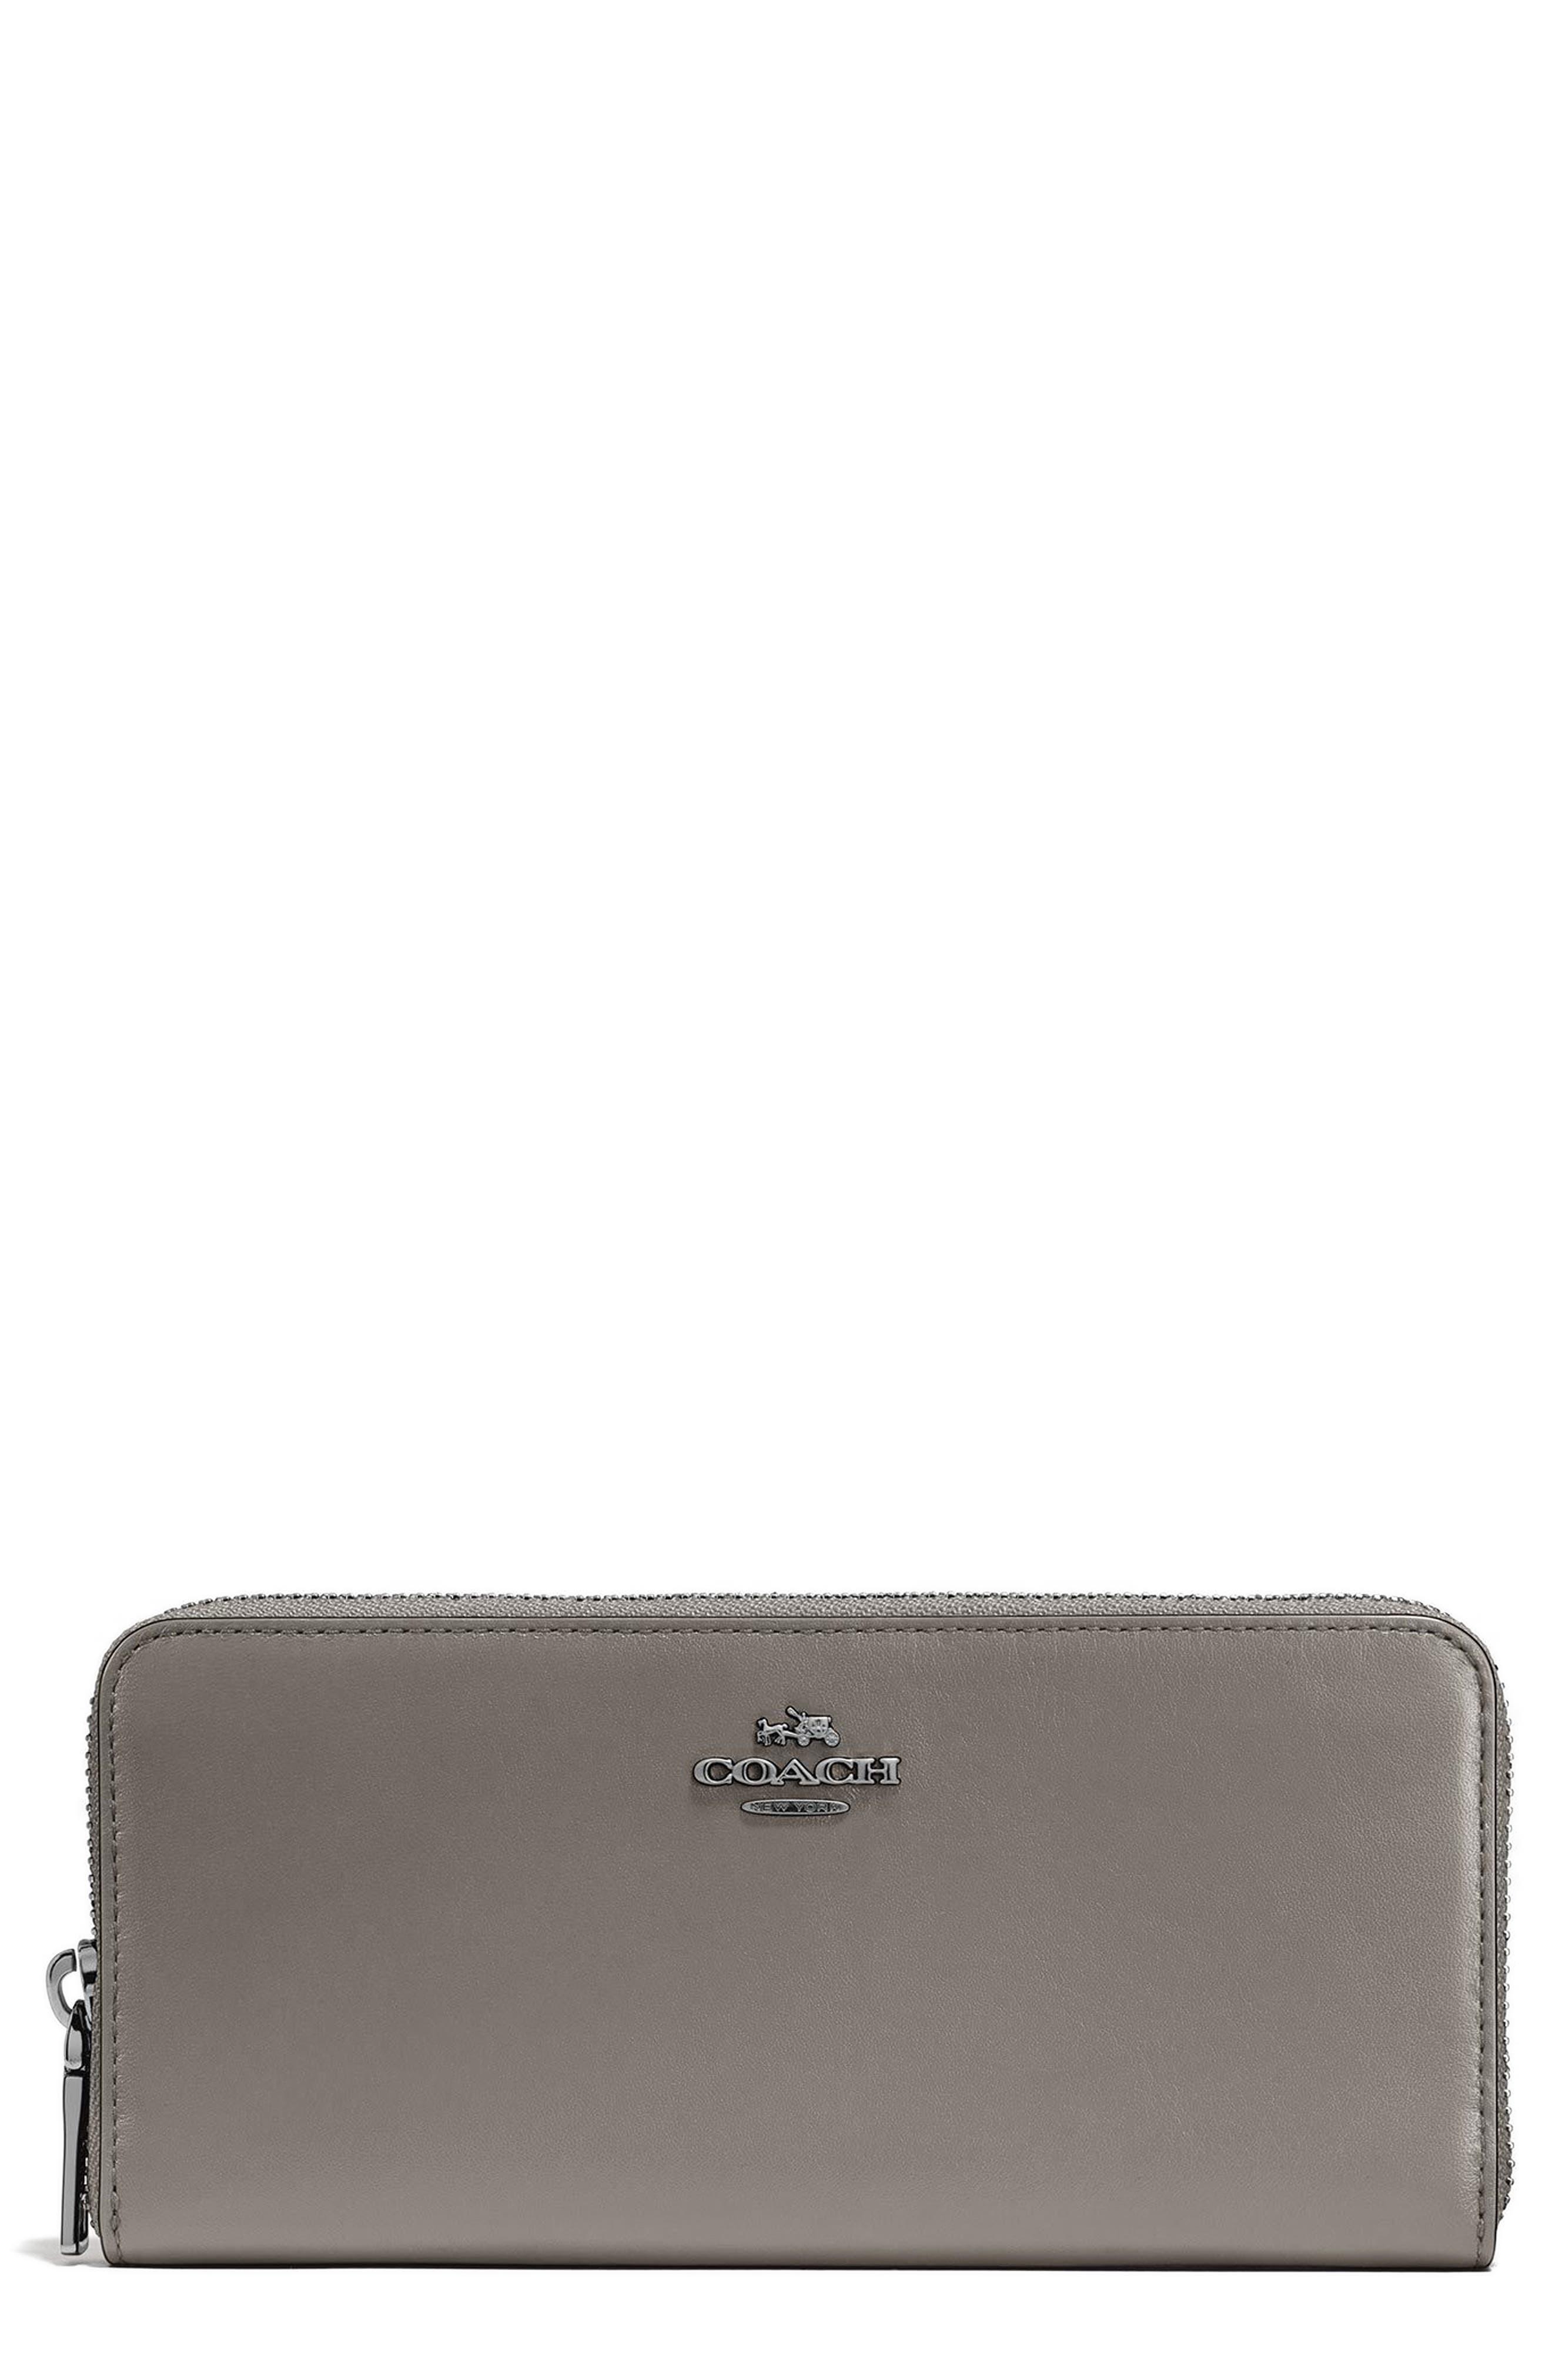 Main Image - COACH Accordion Zip Around Leather Wallet